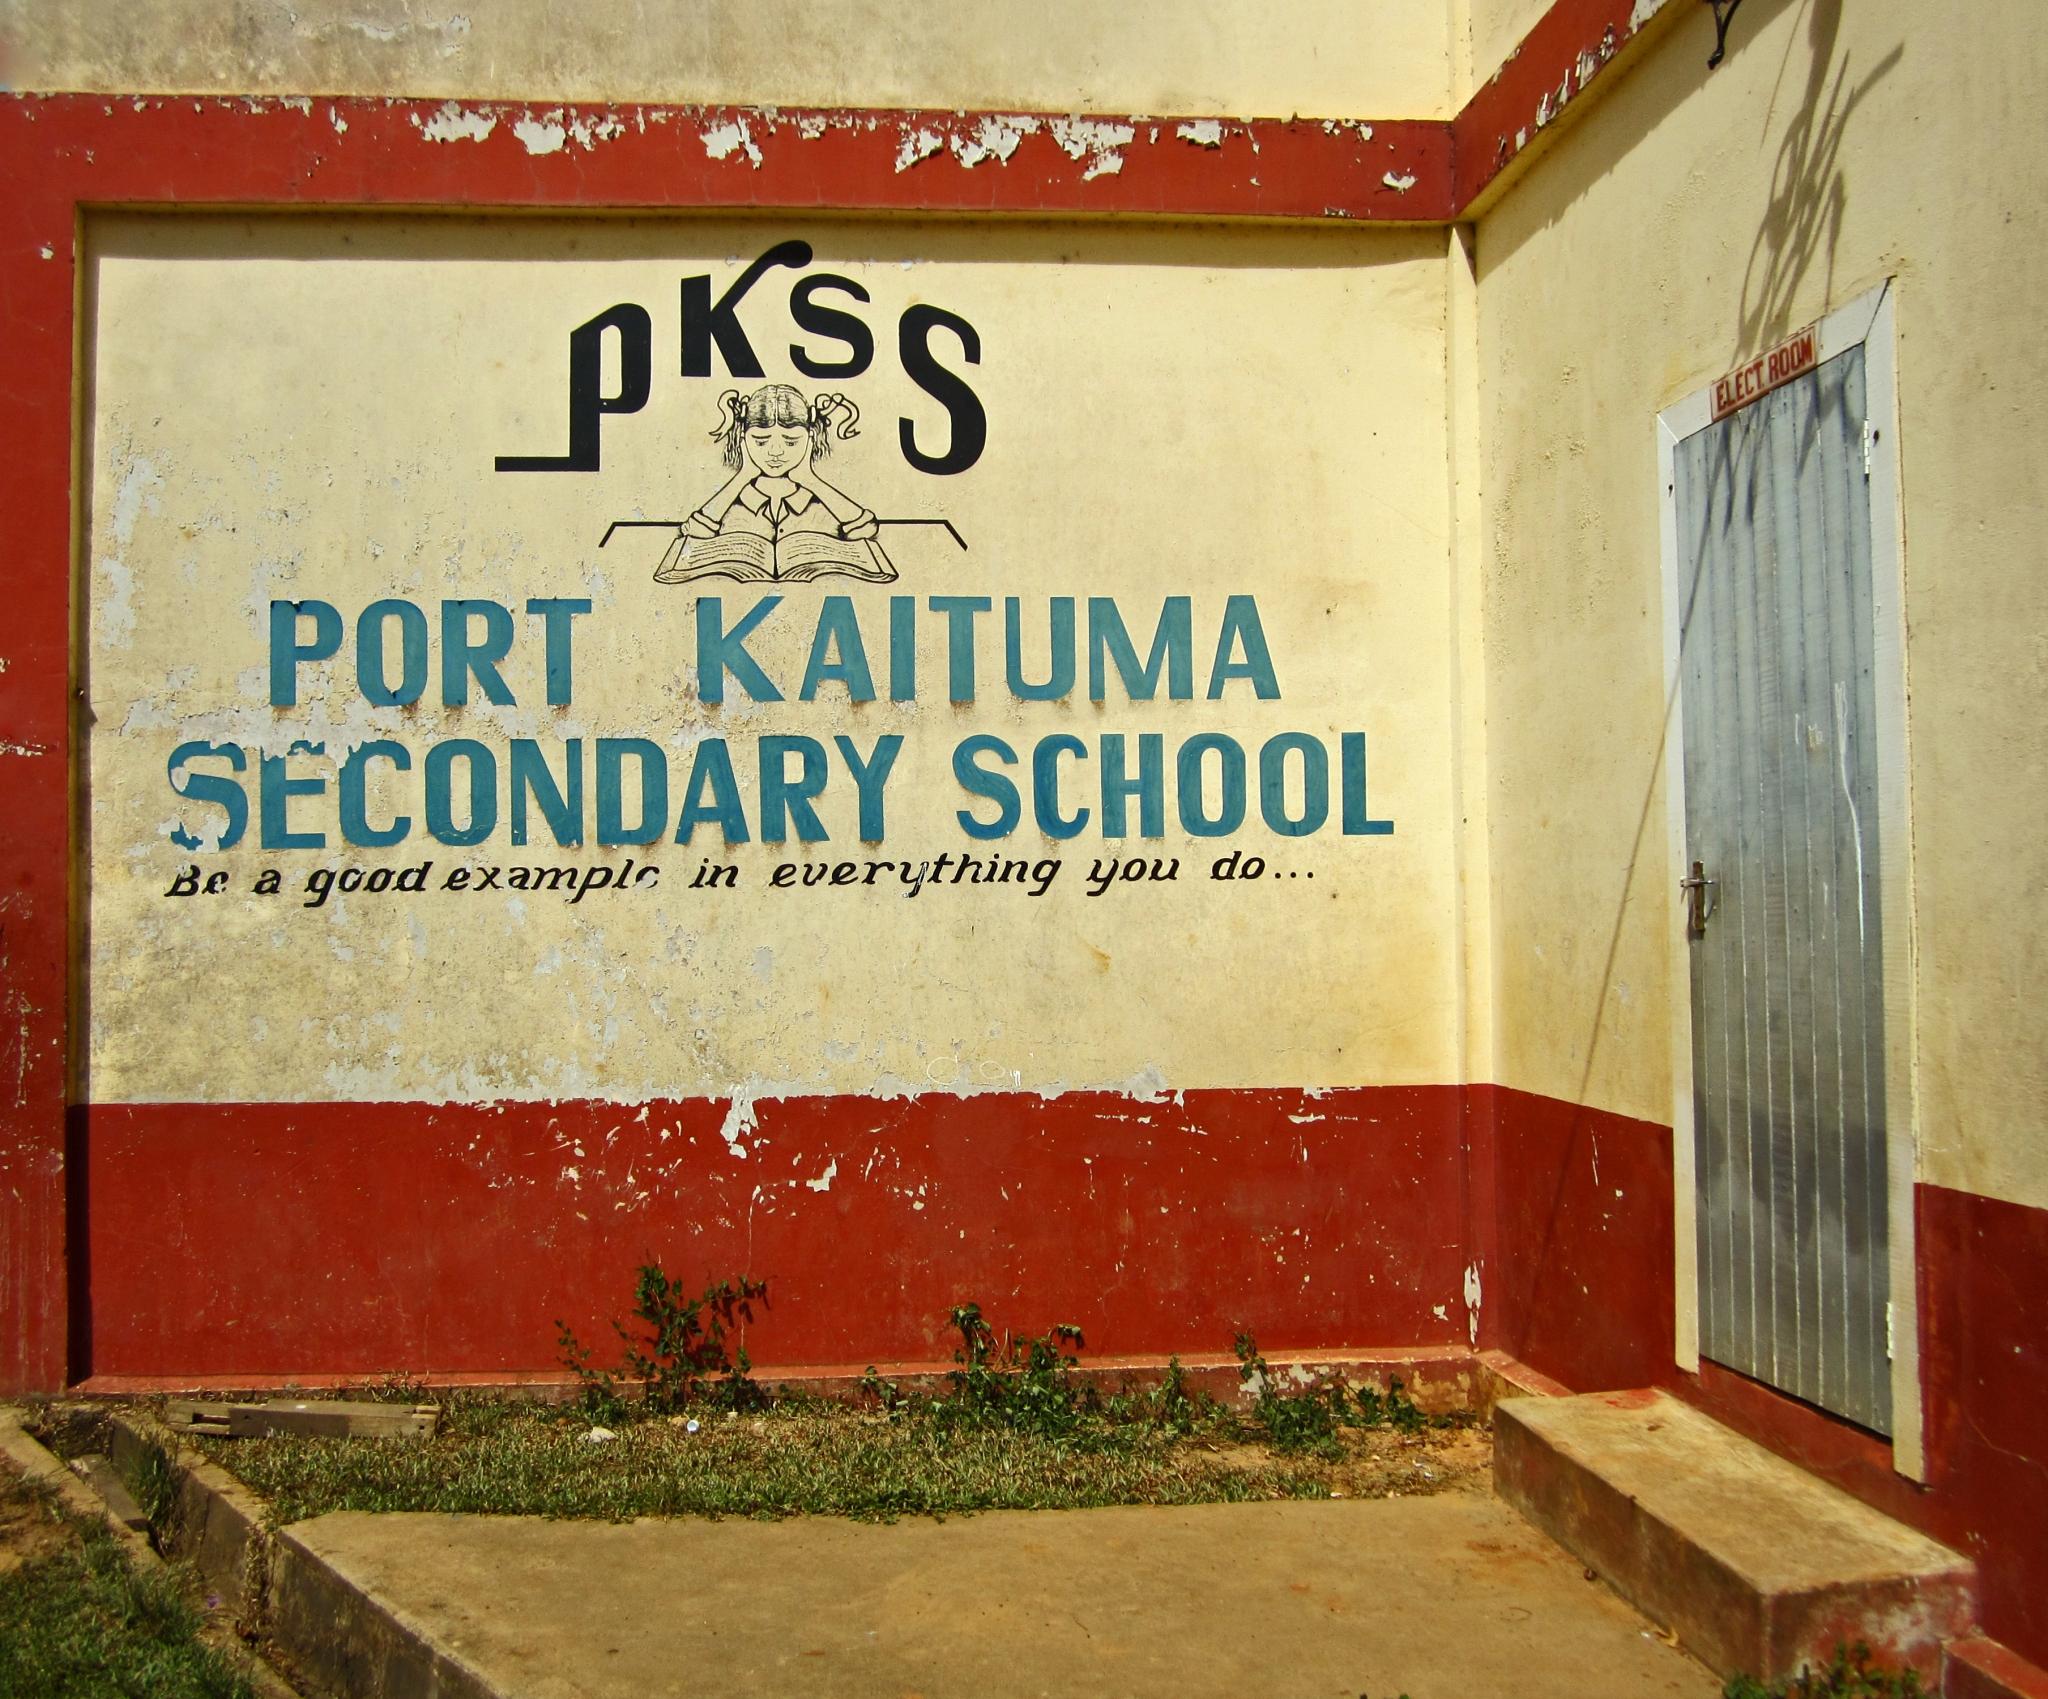 Port Kaituma Secondary School